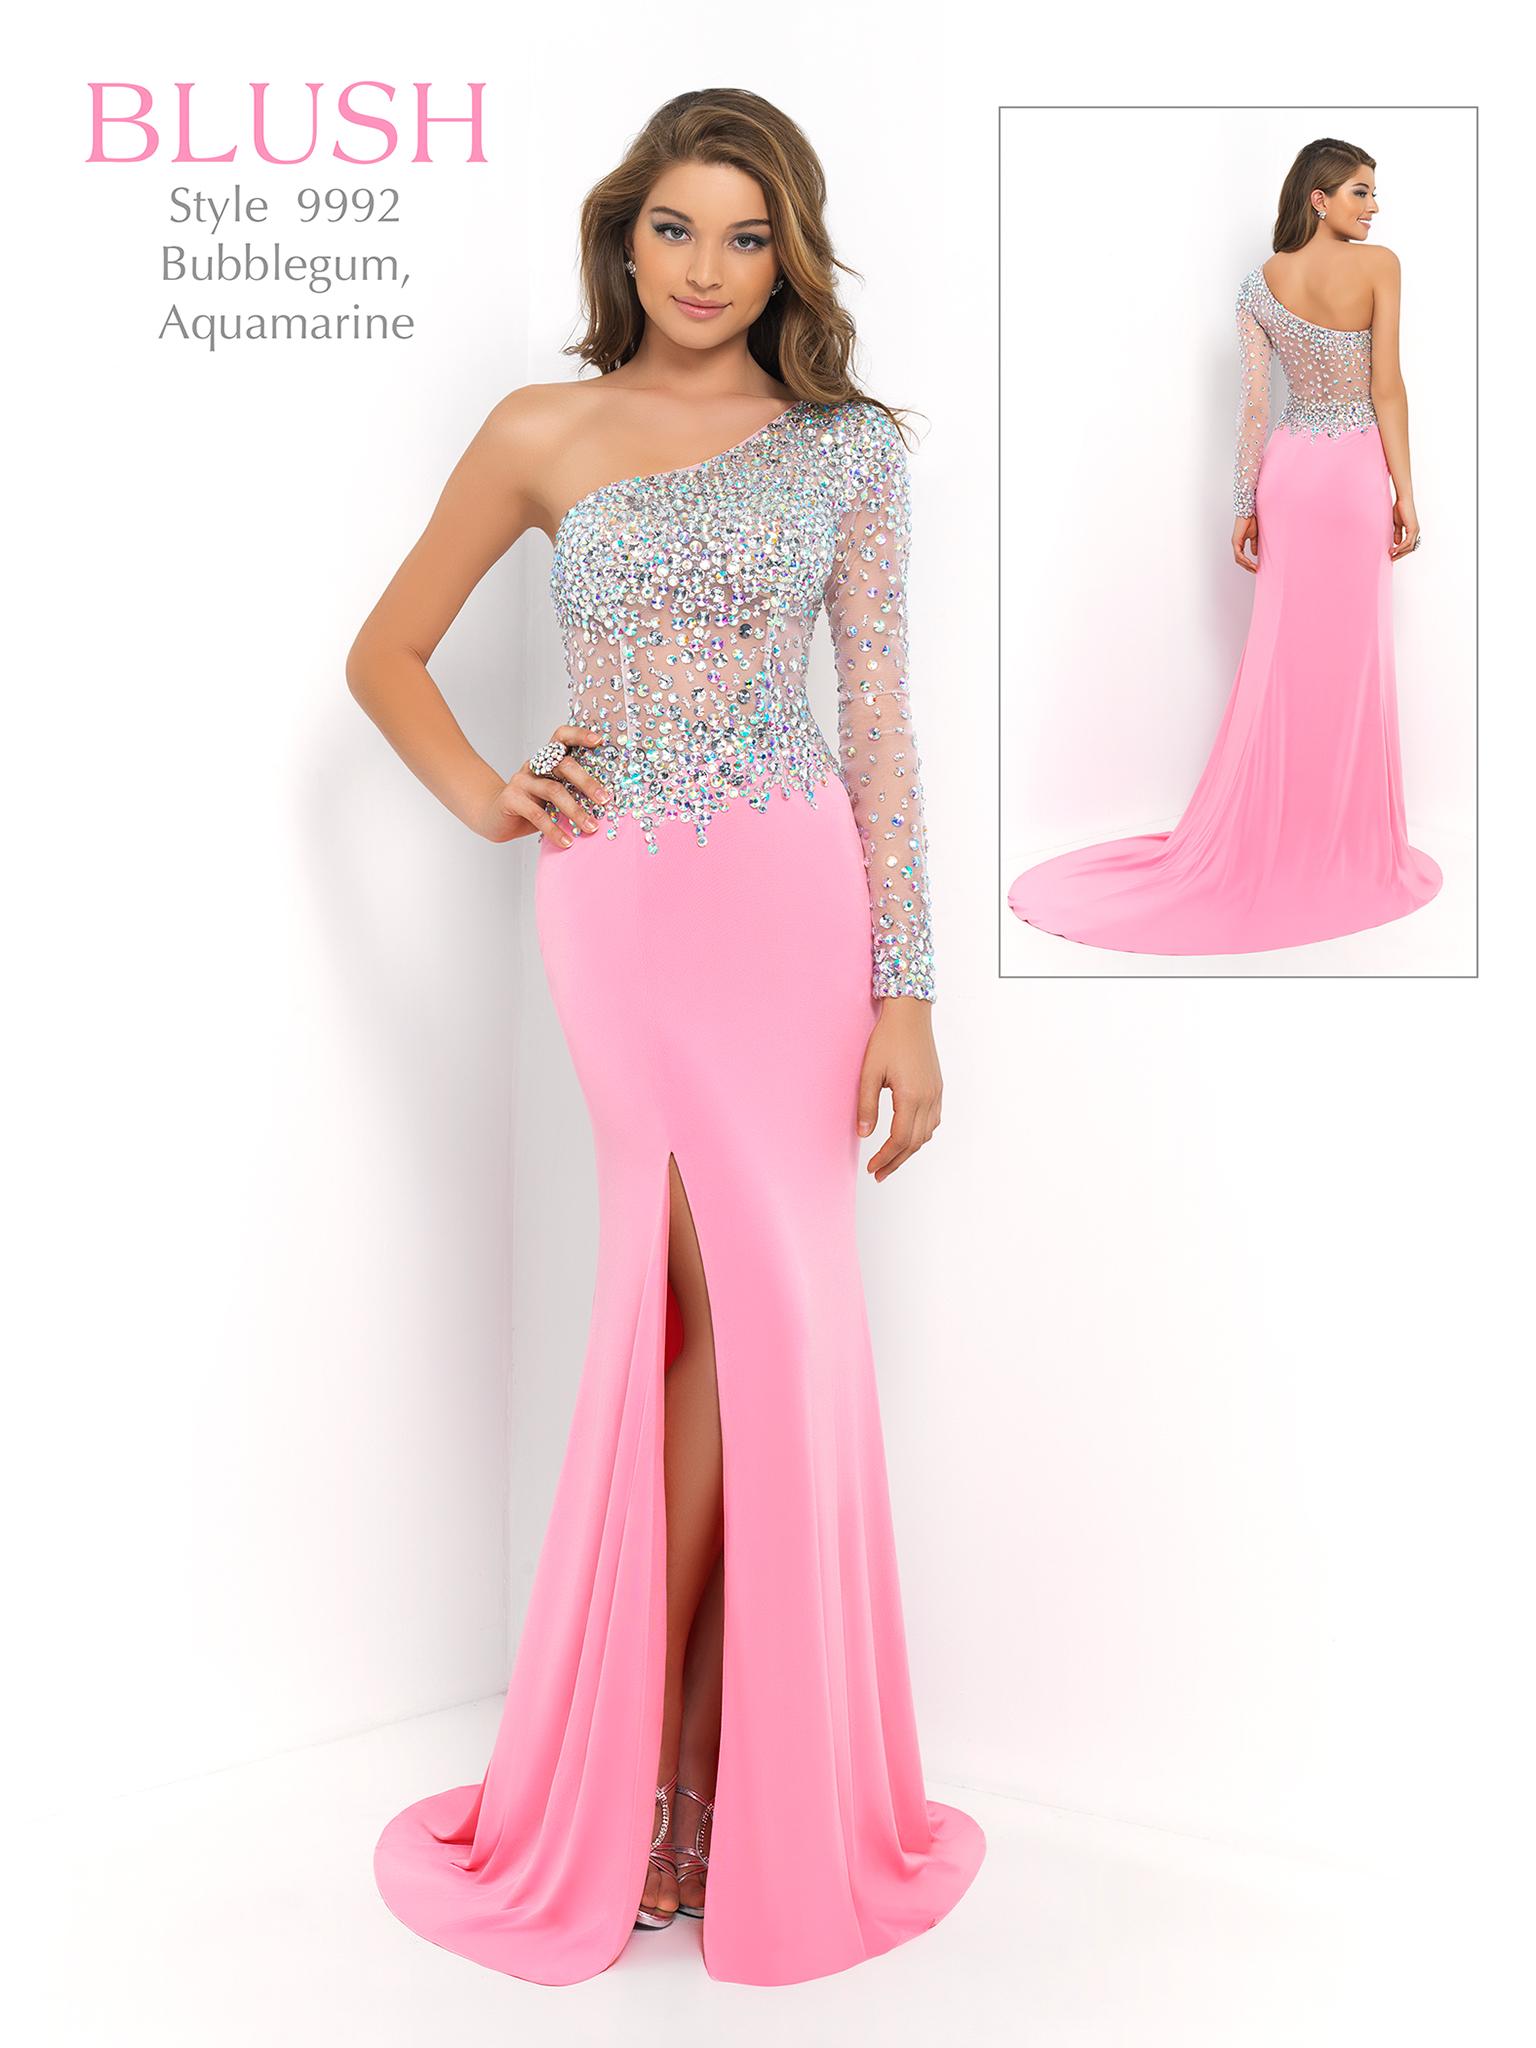 Asombroso Aquamarine Prom Dresses Cresta - Ideas de Vestido para La ...